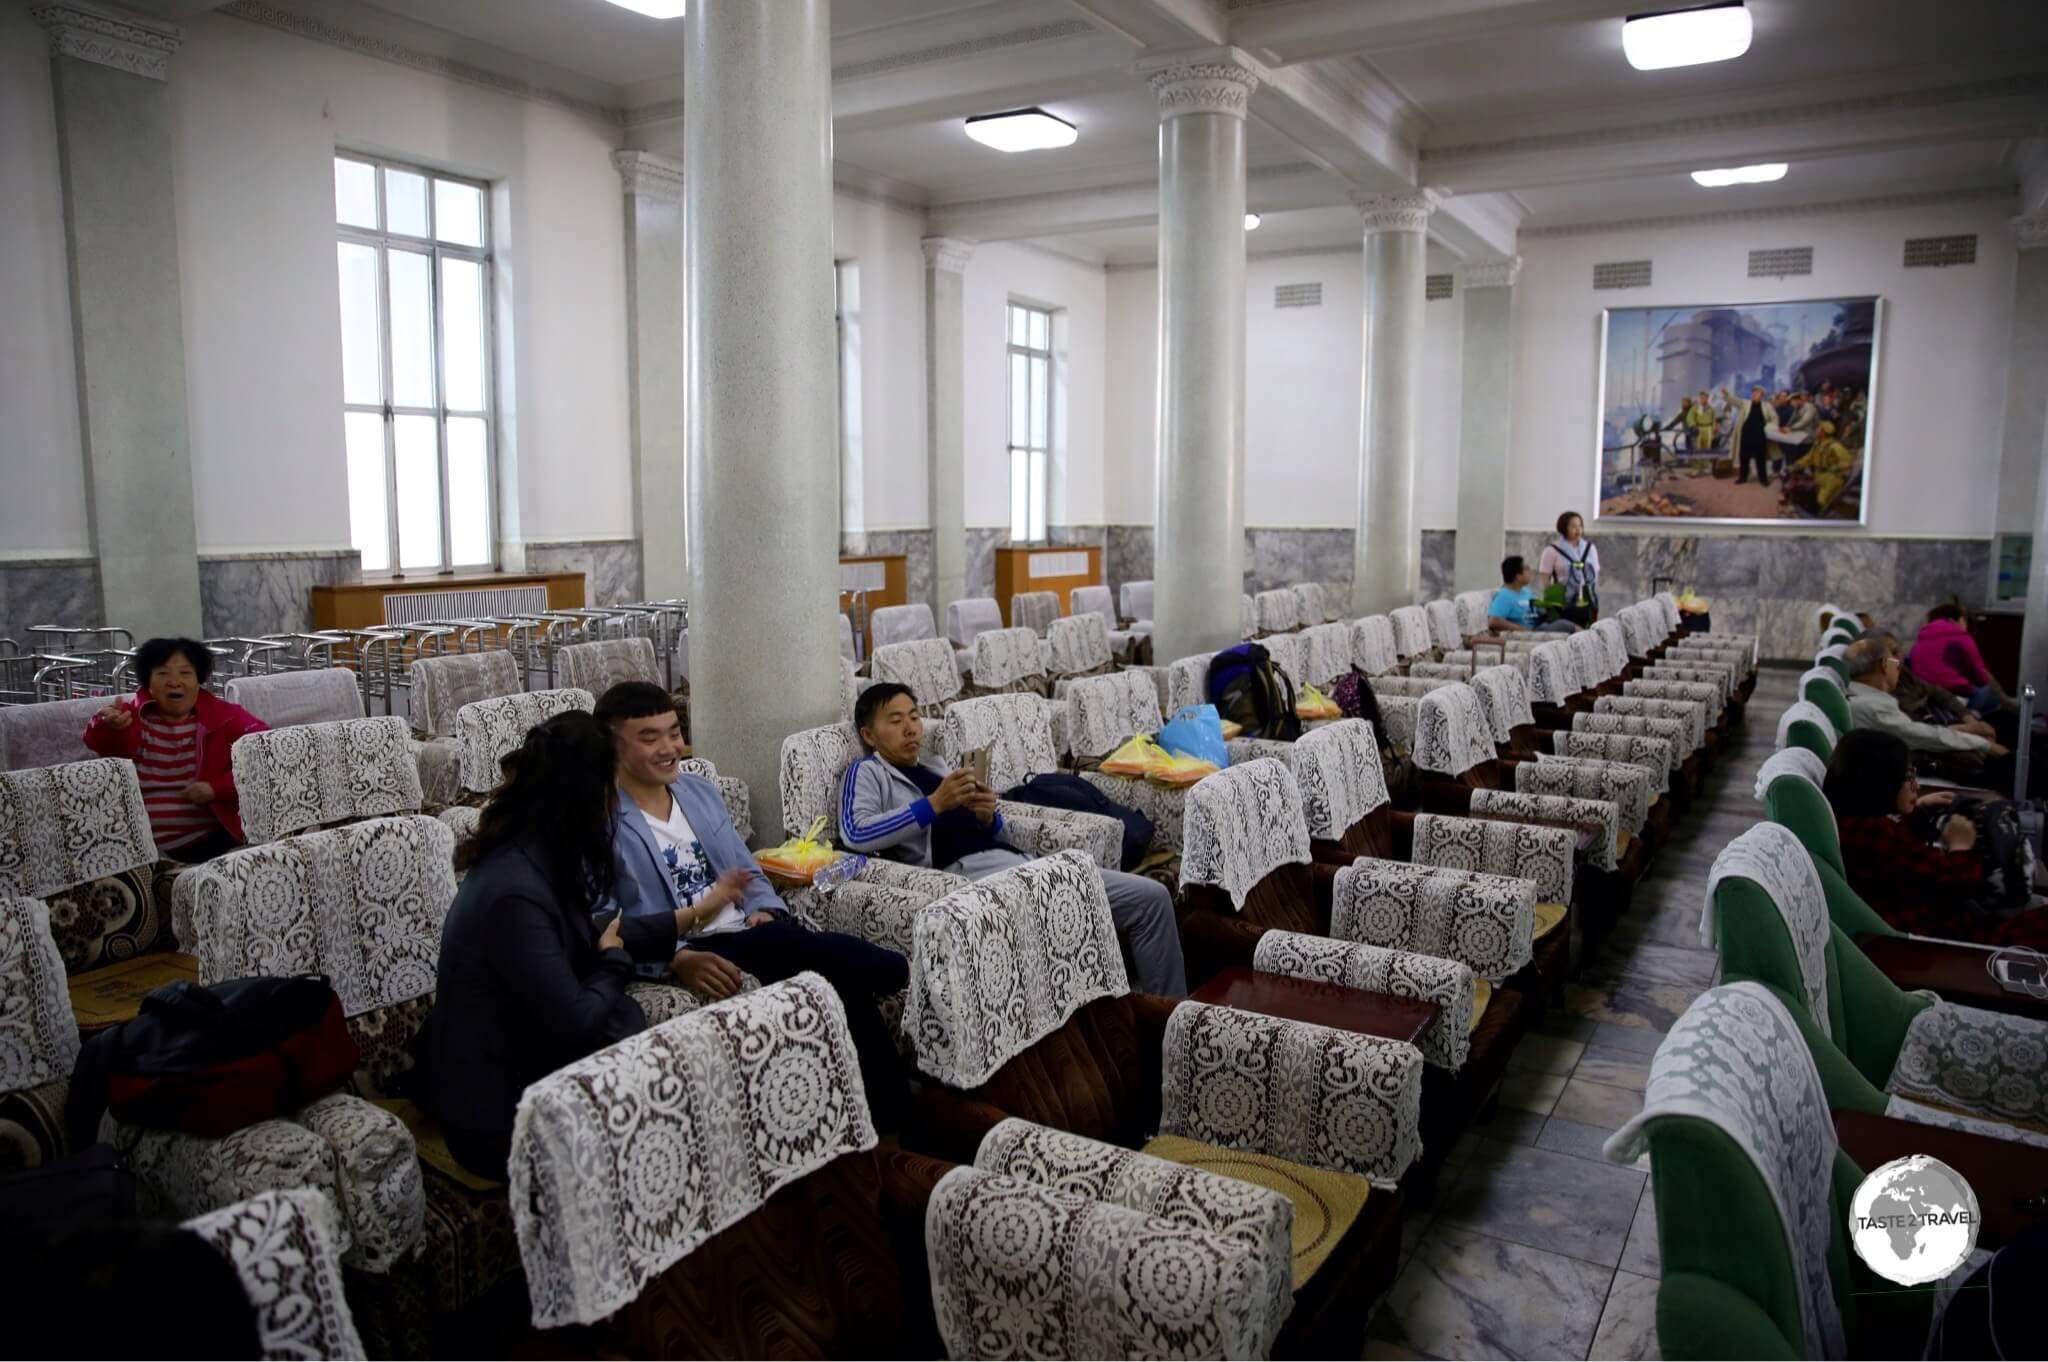 The waiting room at Pyongyang railway station.